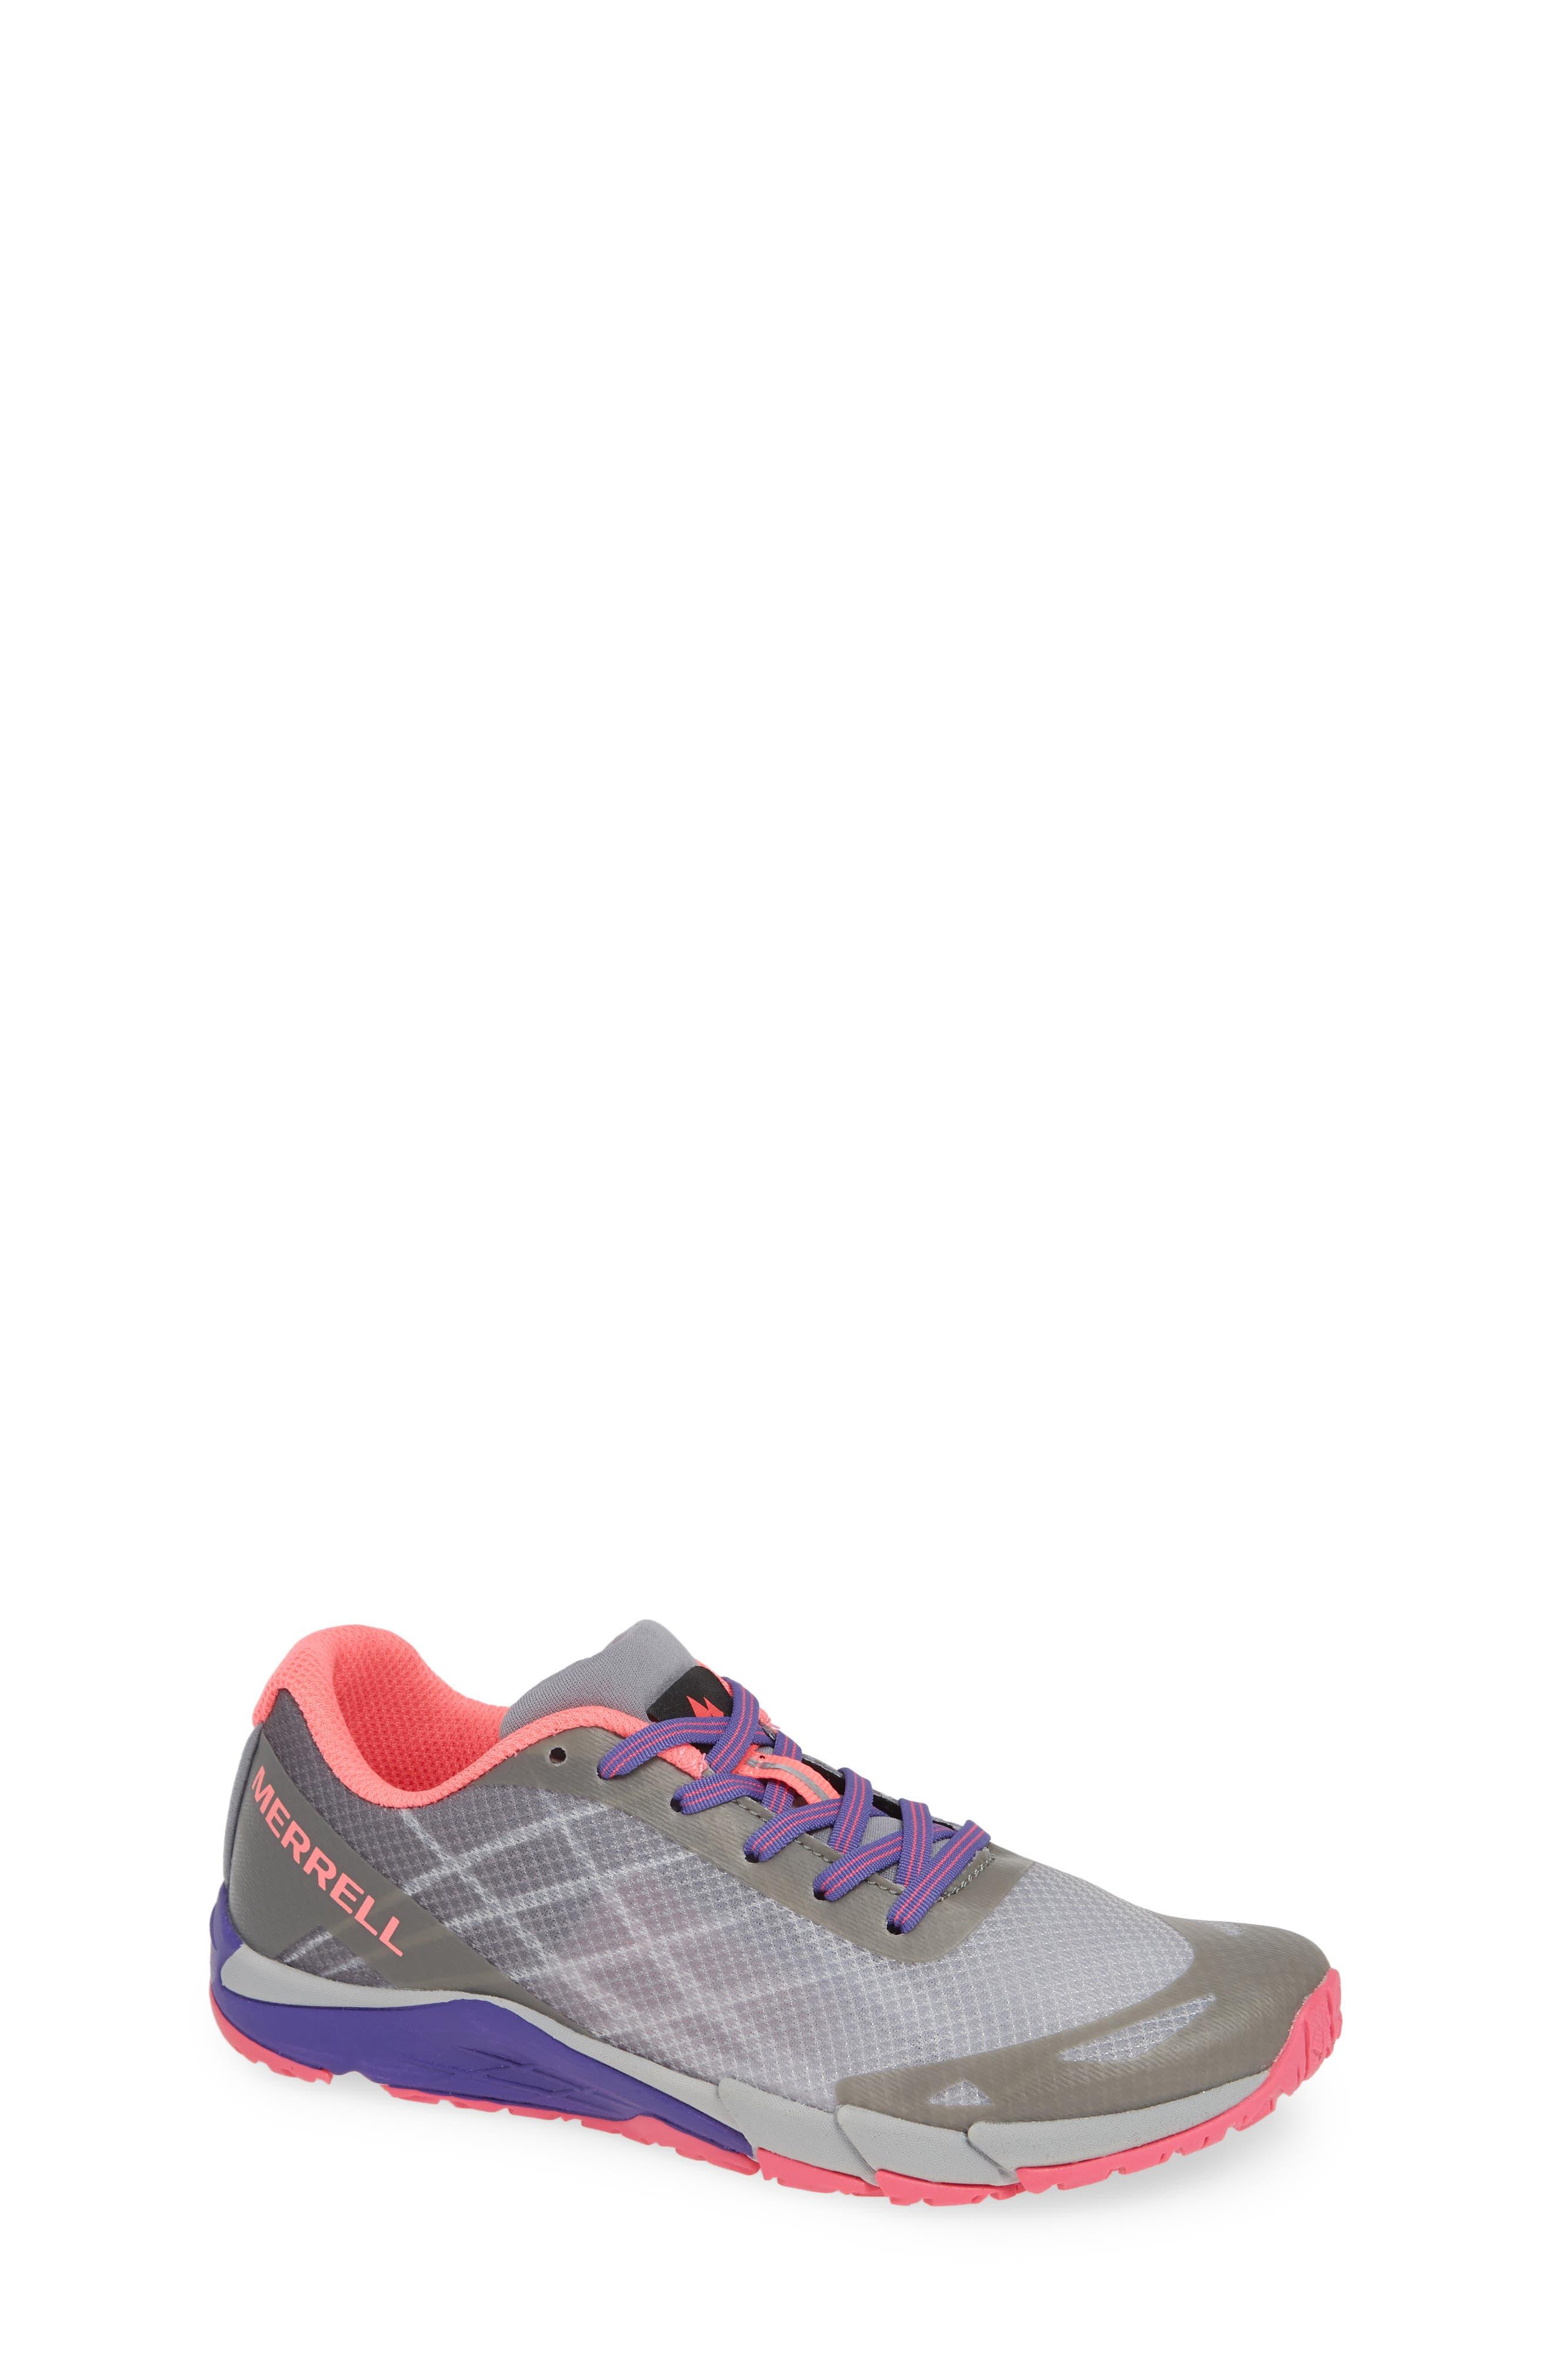 MERRELL Bare Access Sneaker, Main, color, GREY/ MULTI SYNTHETIC